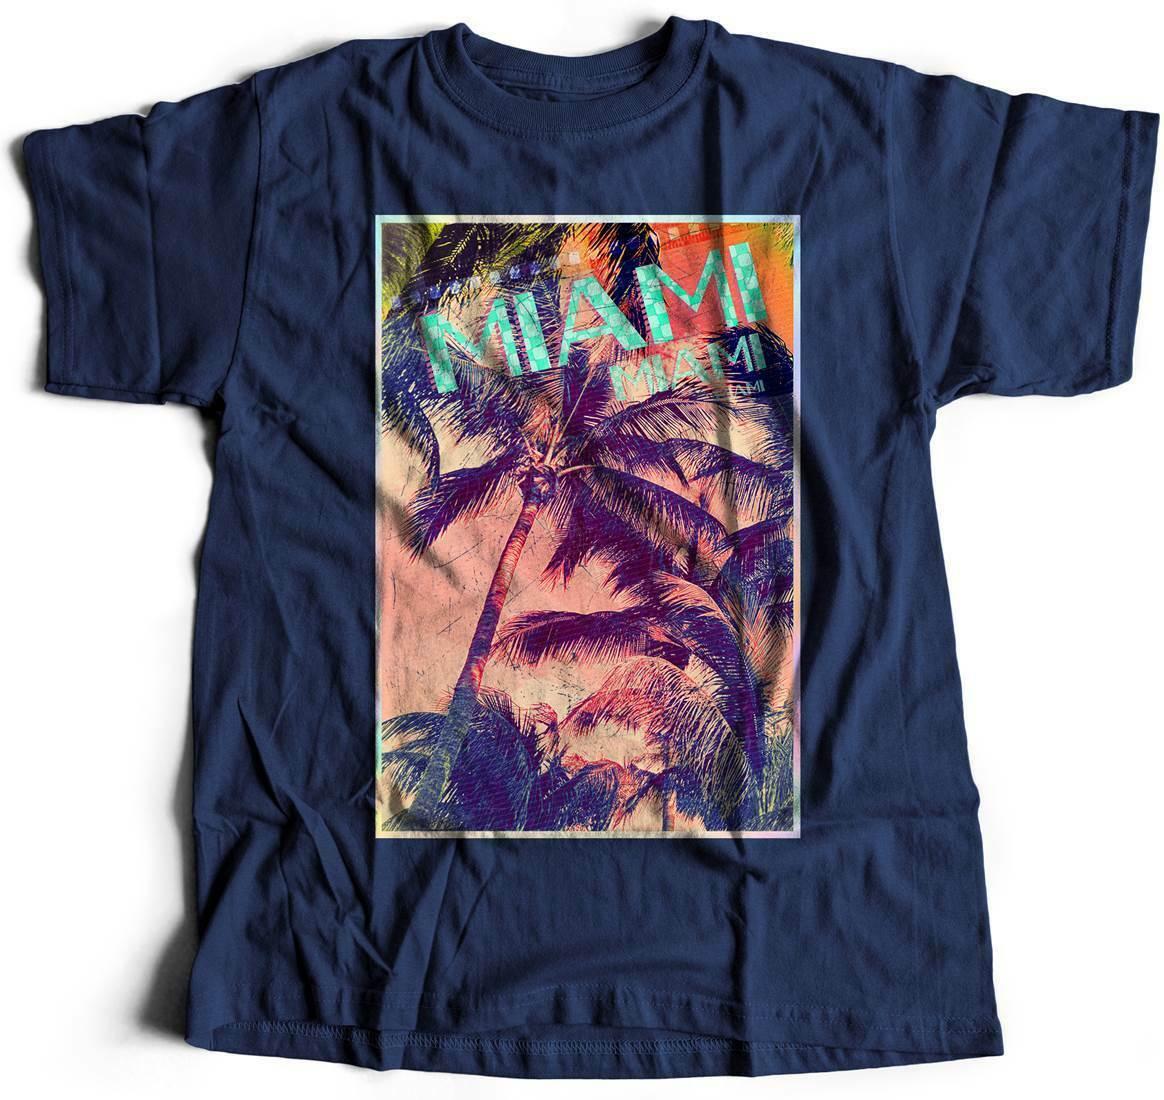 Miami Art T-Shirt Holiday Palms Summer Sexy Beach Sun Sea Fashion Florida J A877